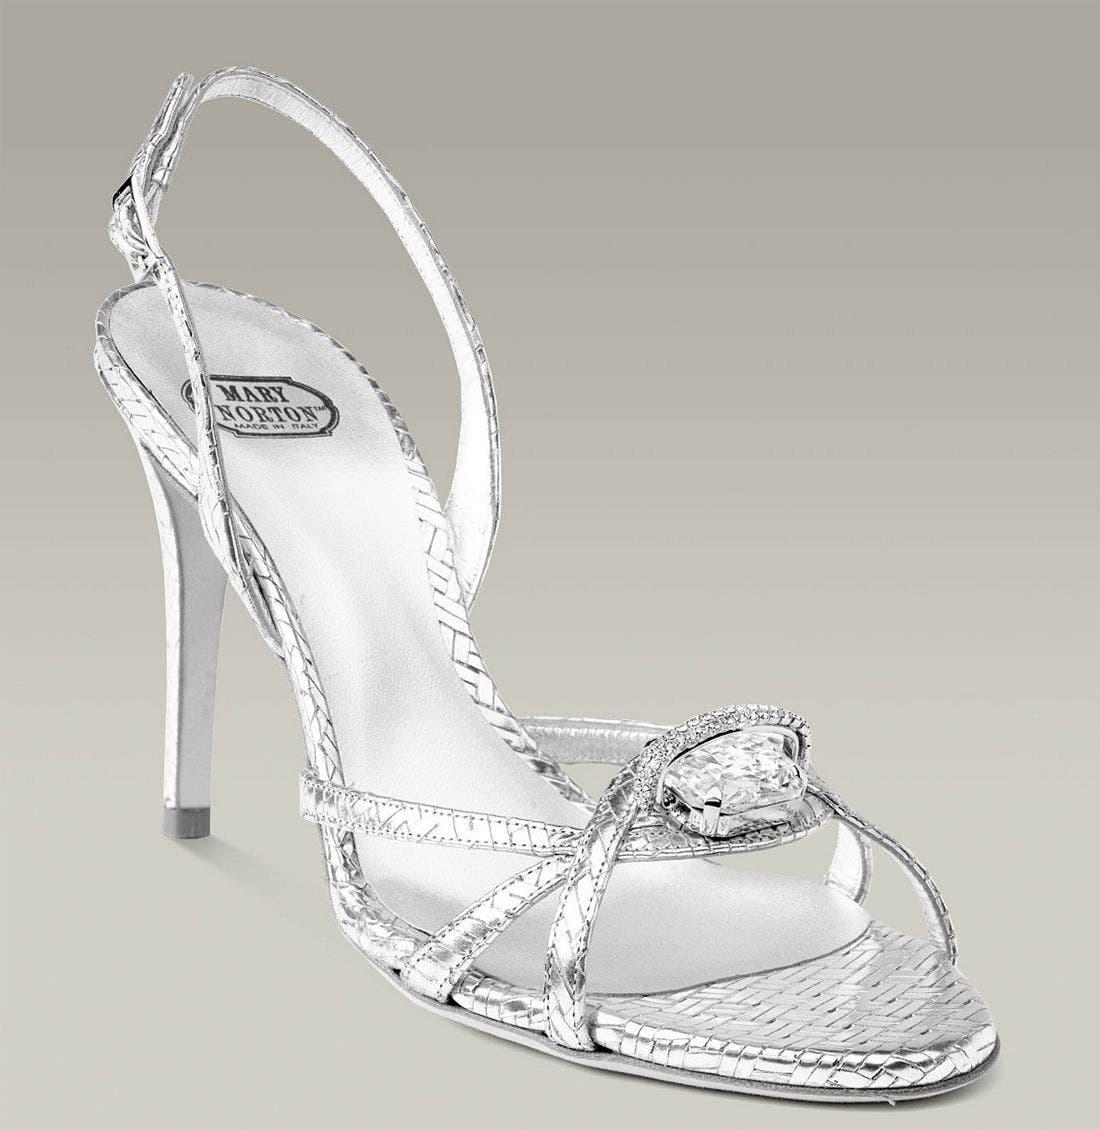 MARY NORTON Metallic Leather Sandal with Swarovski Crystal, Main, color, 040